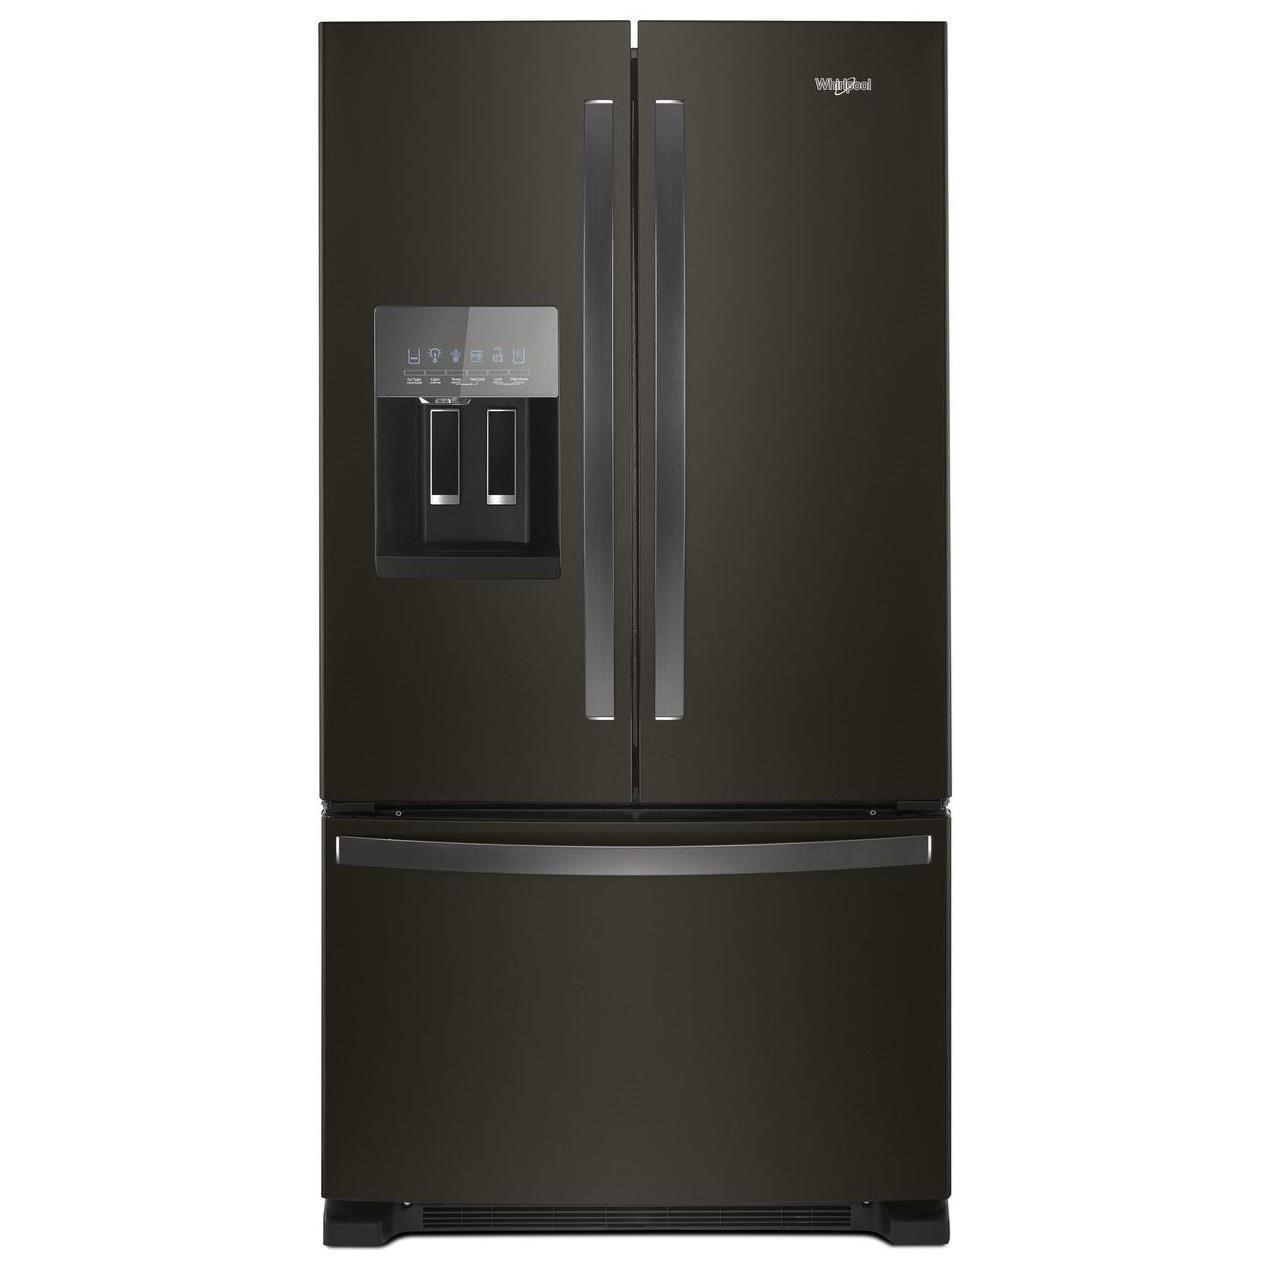 Whirlpool Wrf555sdhv 36 Inch Wide French Door Refrigerator